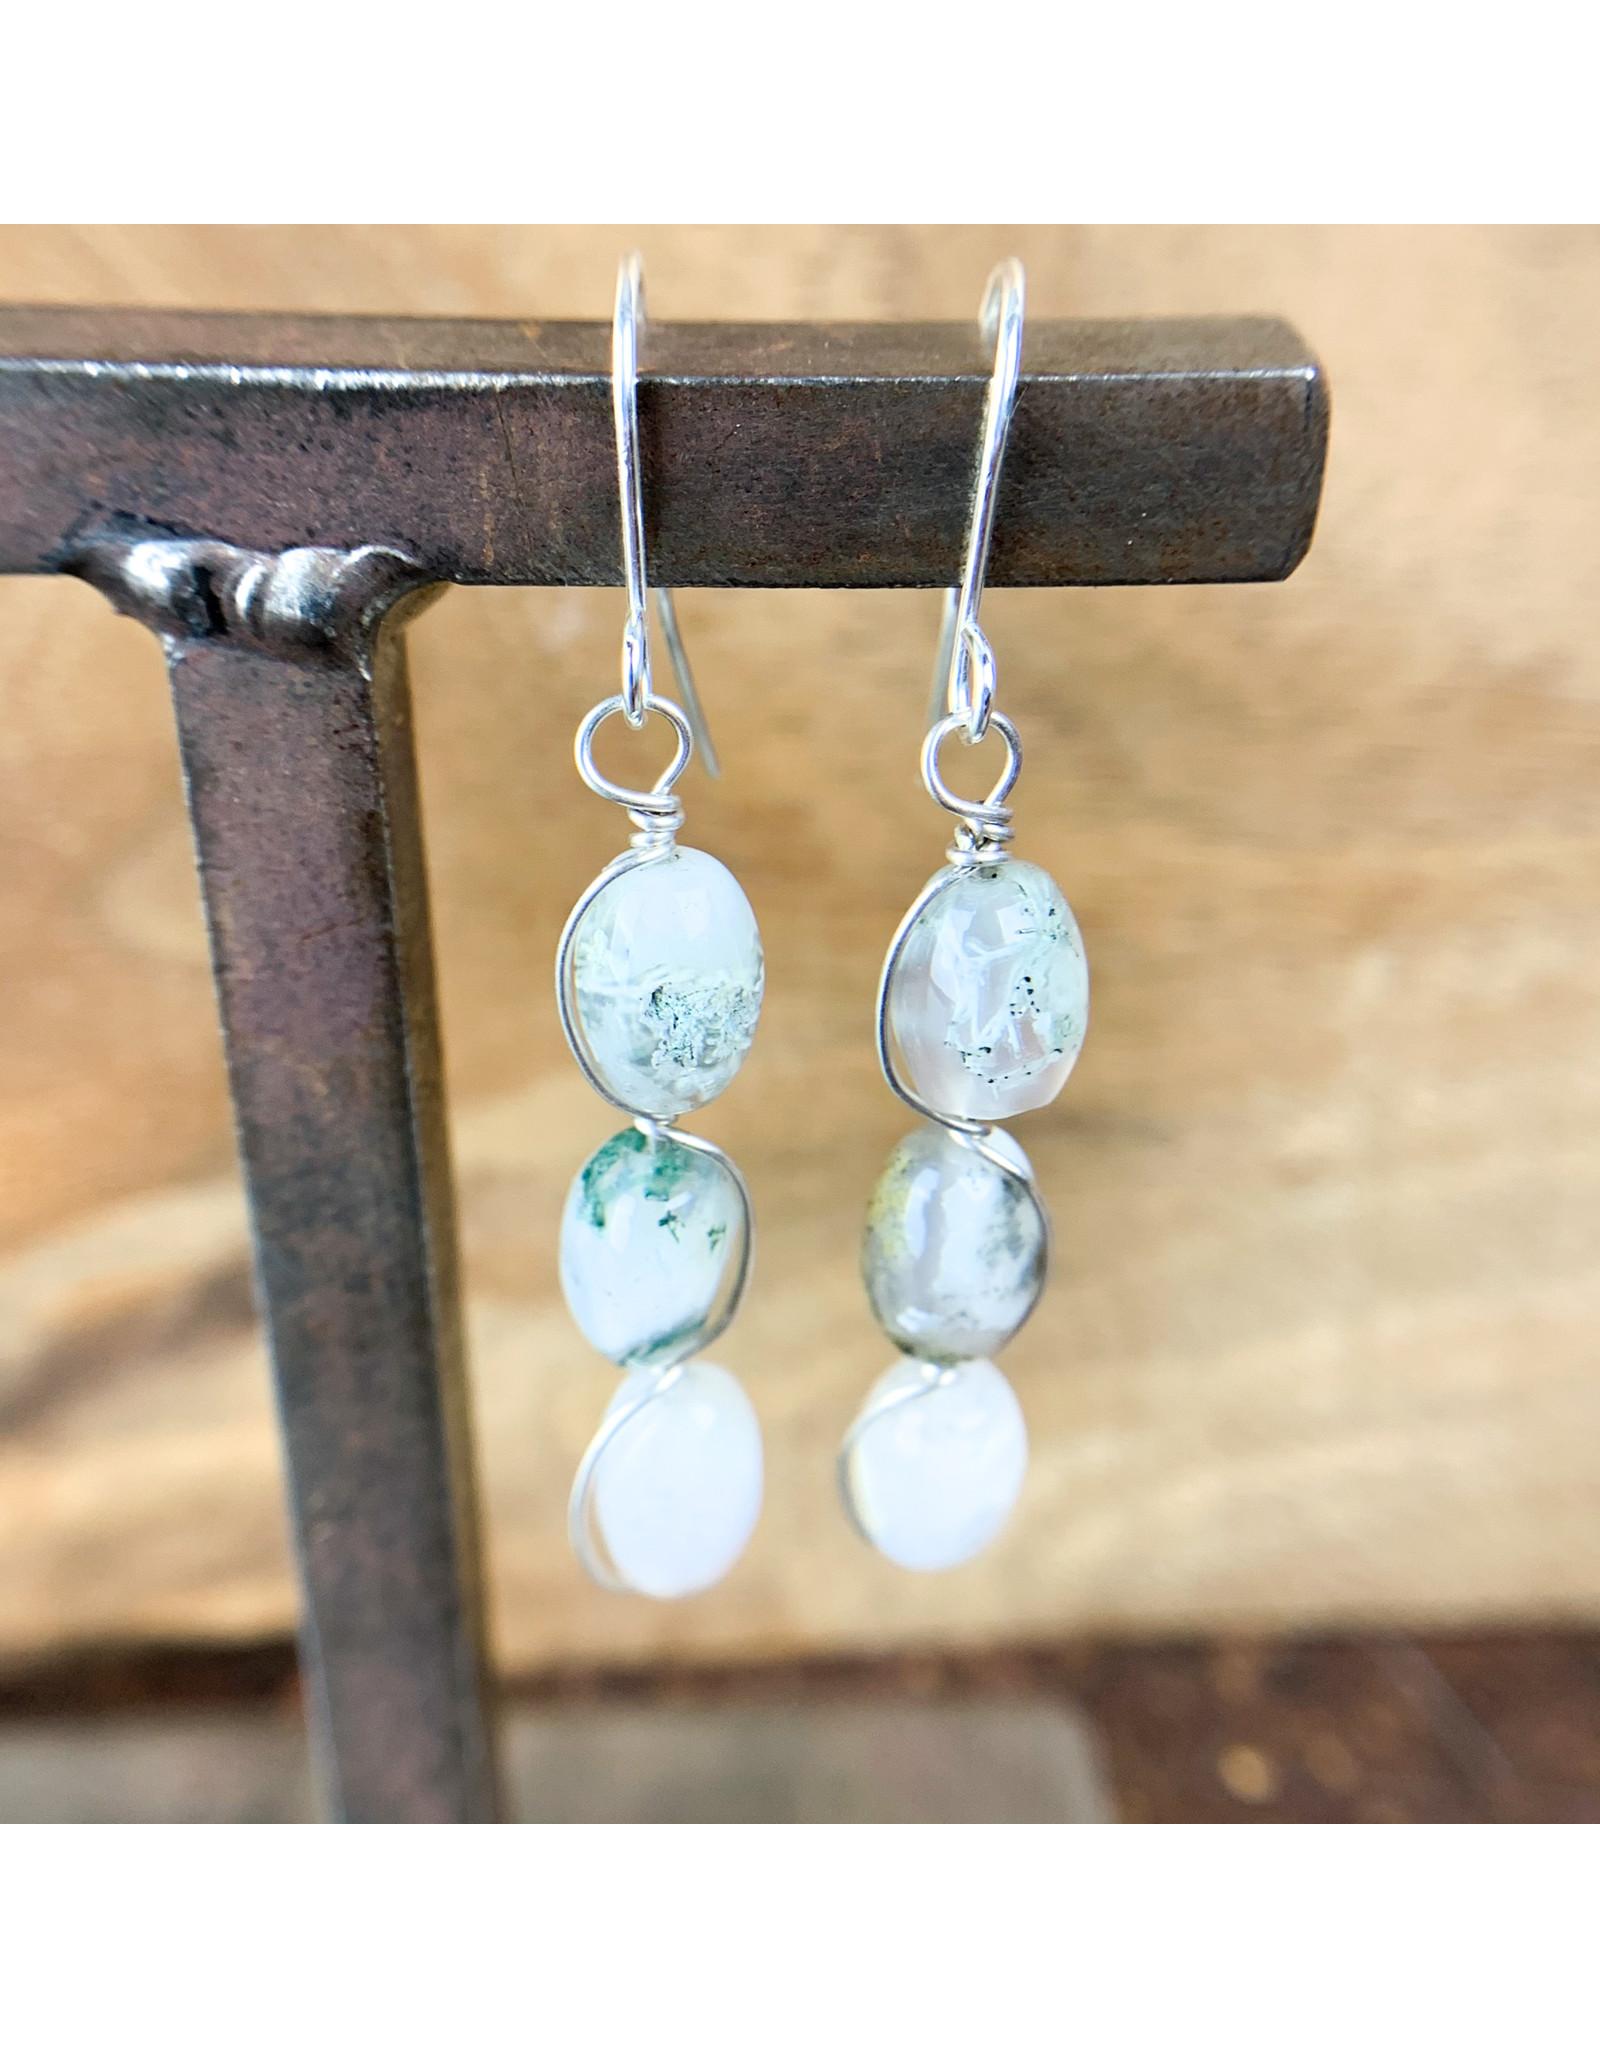 Moss Agate 3pc Earrings - NC18